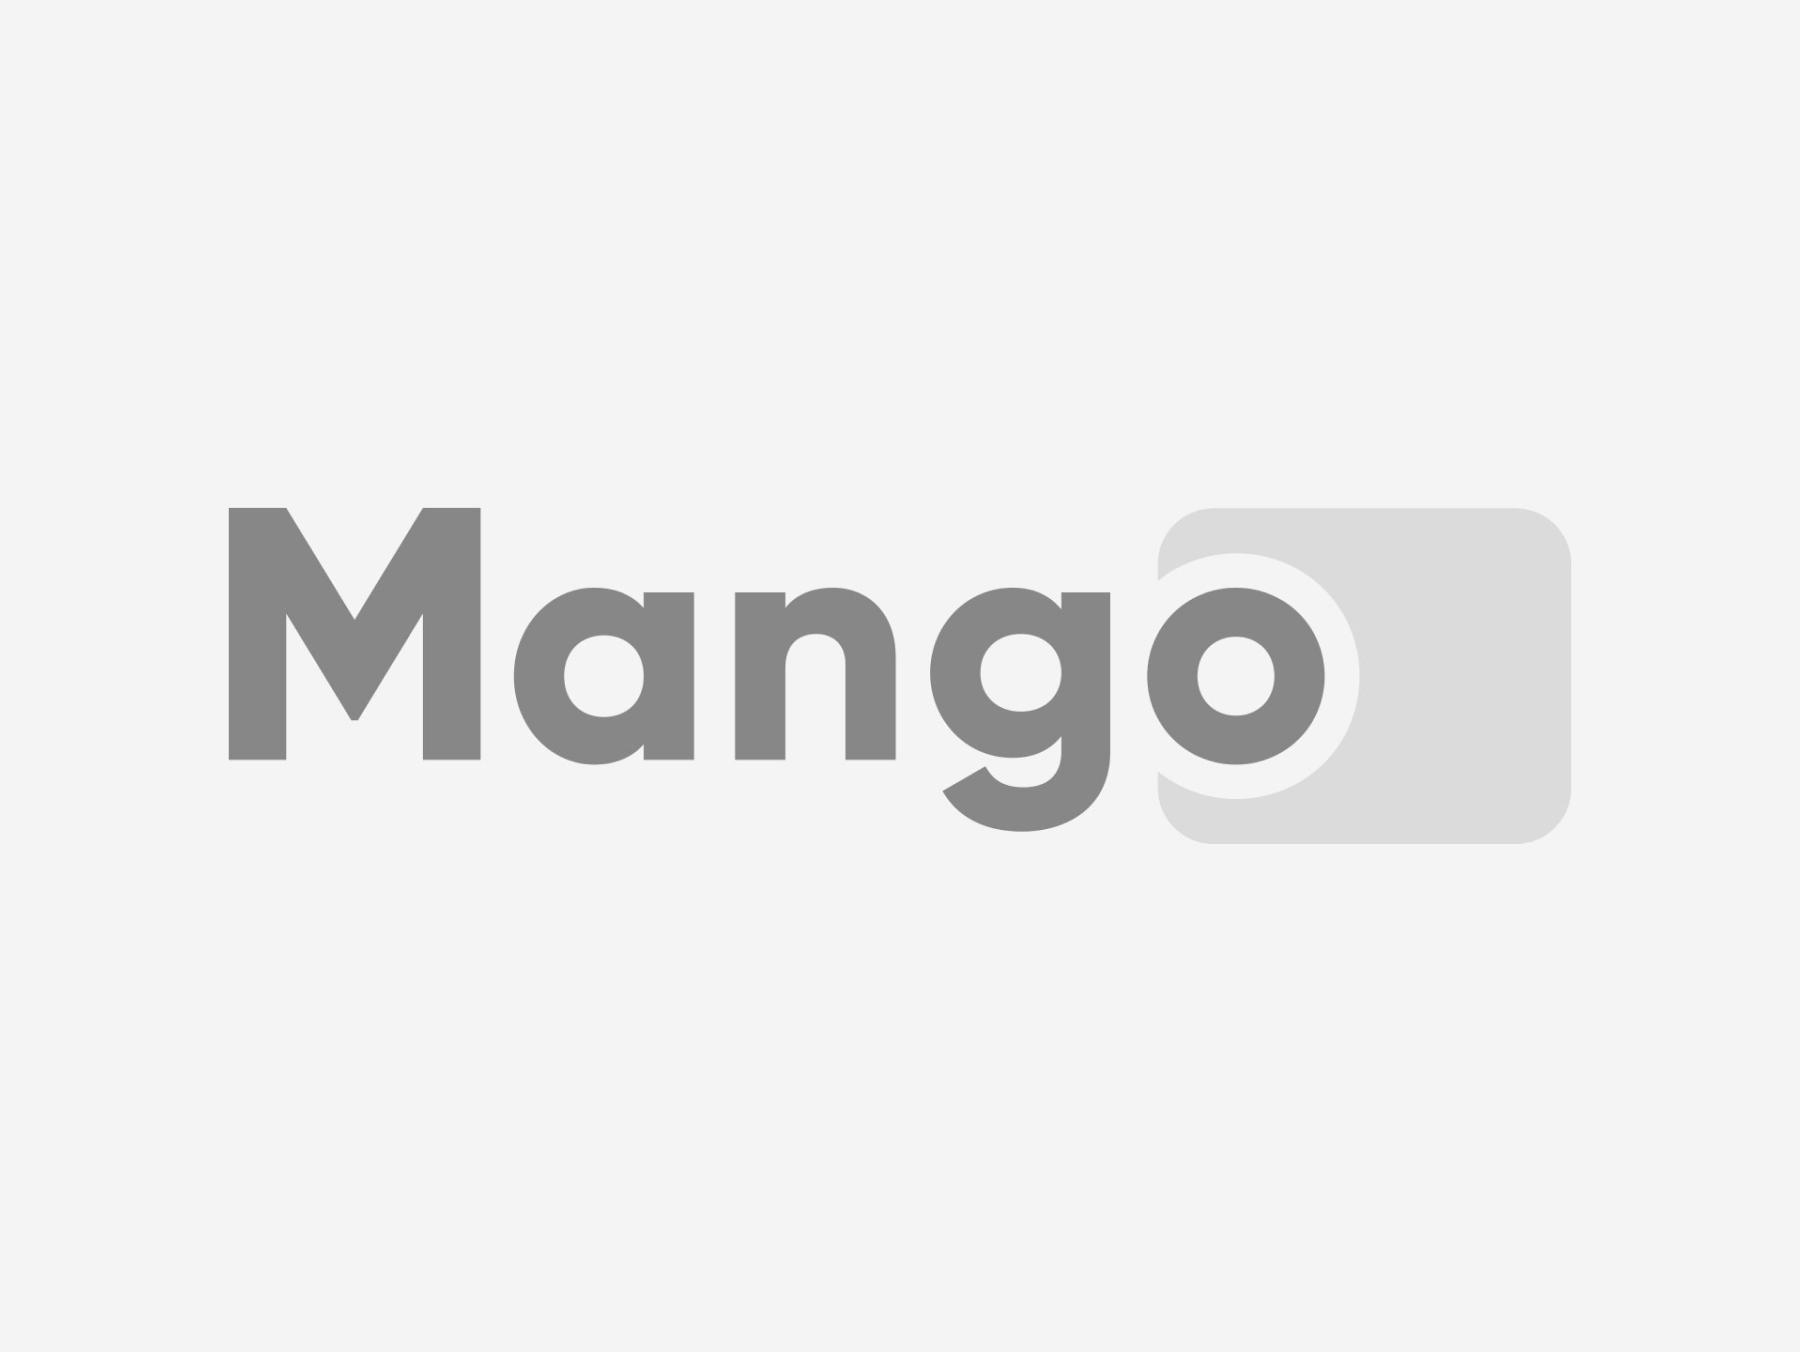 Ghete Pentru Barbati Ankle Shoes 4.0 Walkmaxx Pure